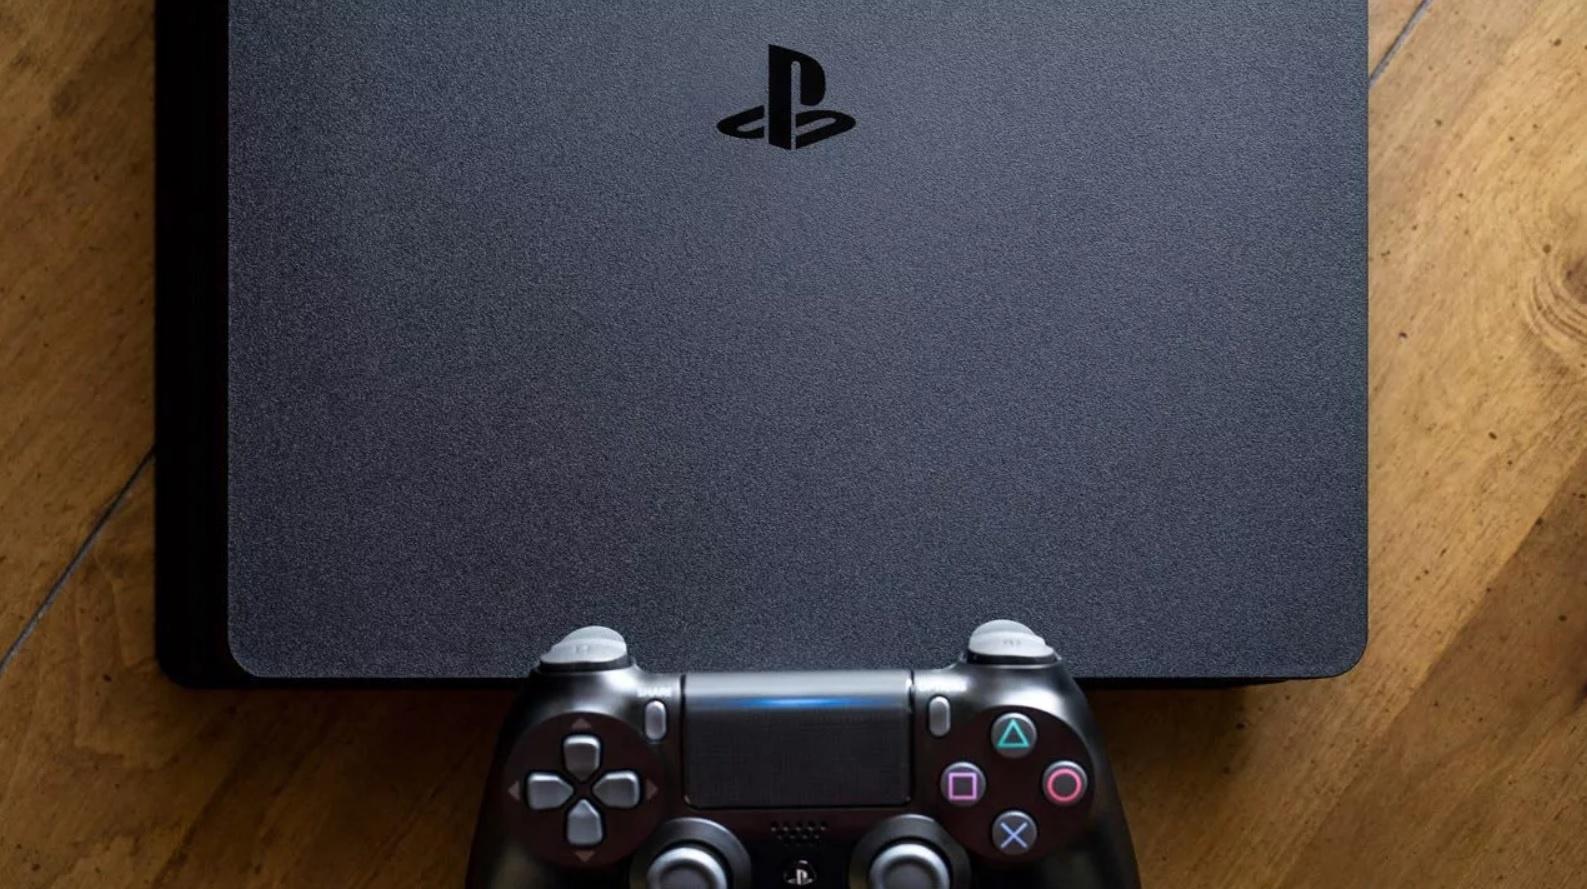 Пиар-агентство PlayStation: выход PS5 всё ещё запланирован на конец года